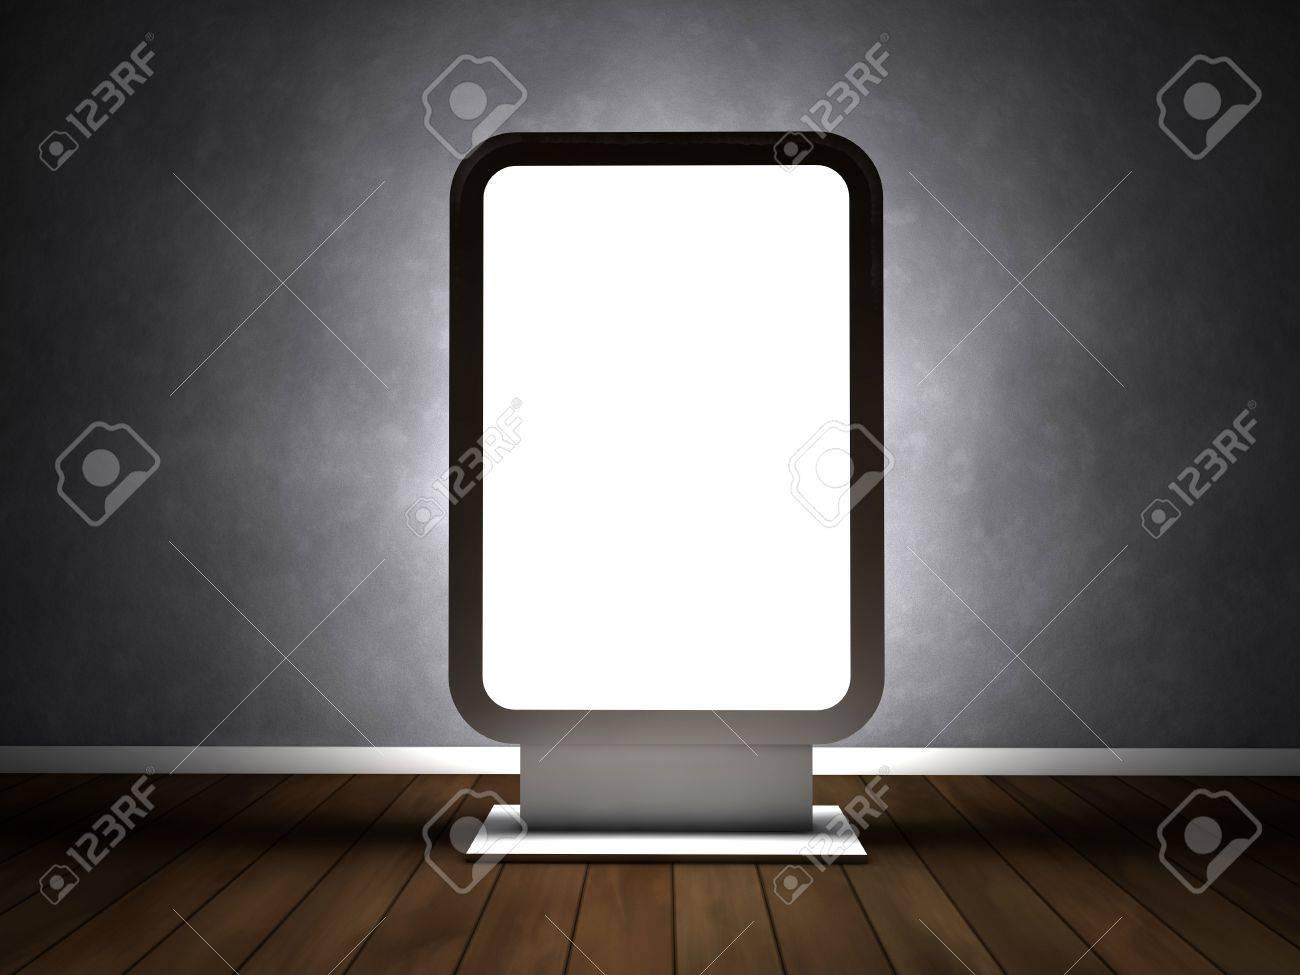 Blank advertising billboard in empty room Stock Photo - 14698781